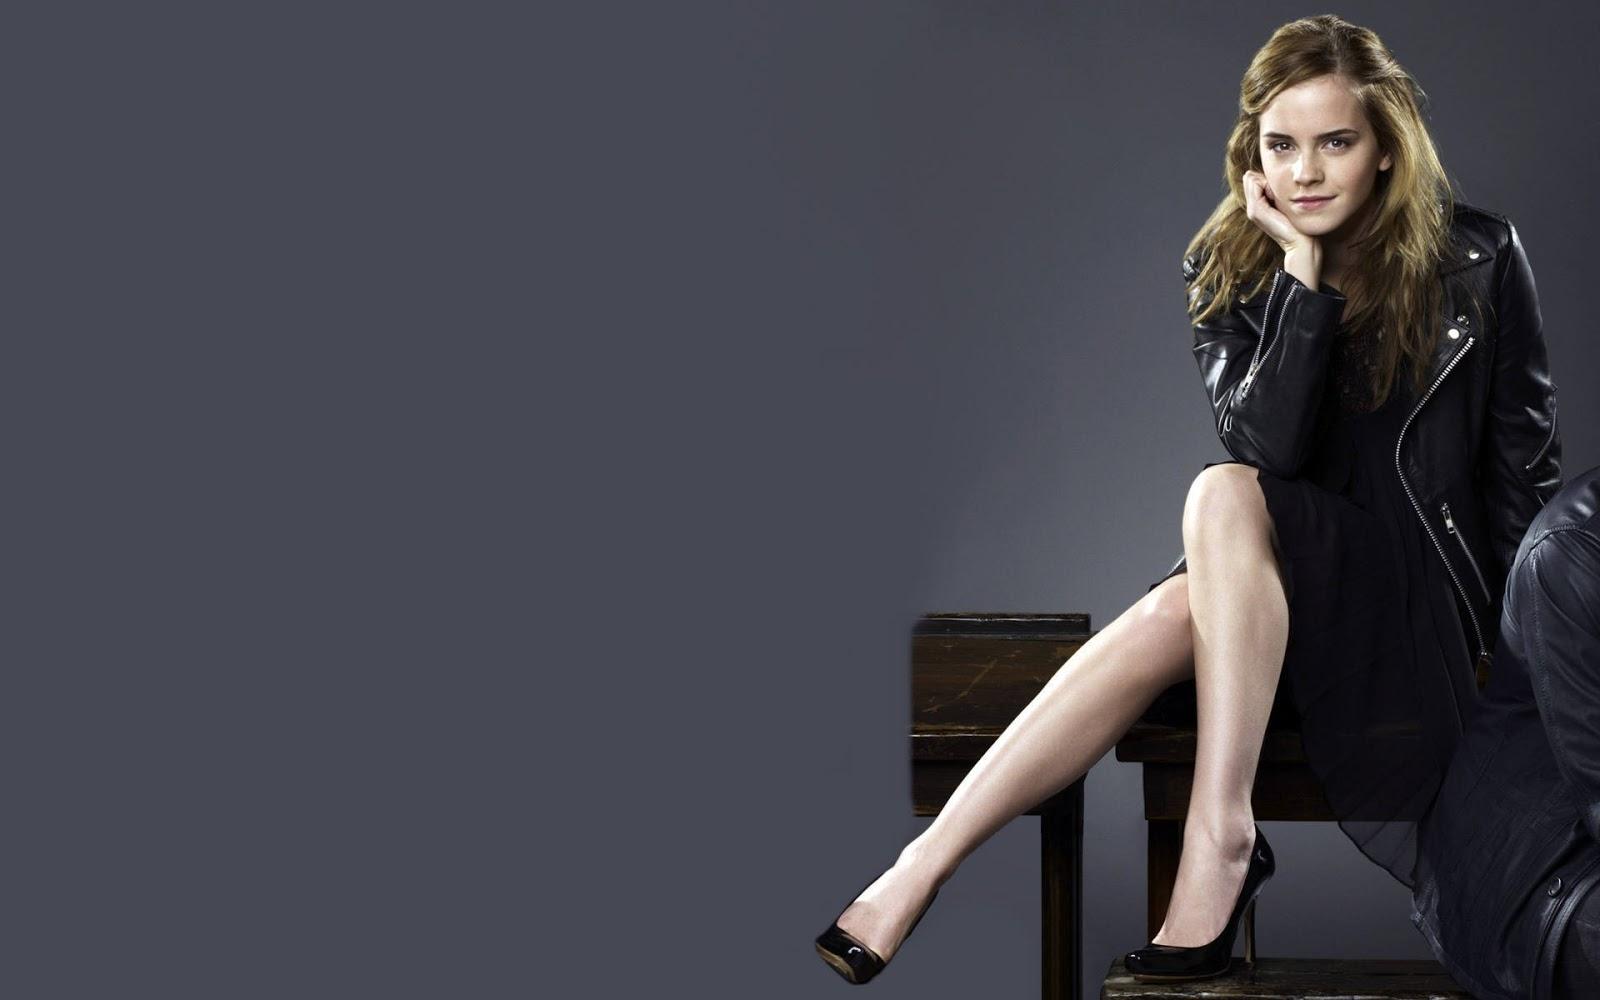 Emma Watson New HD Wallpapers 2013 HOT CELEBRITY Emma Stone 1600x1000